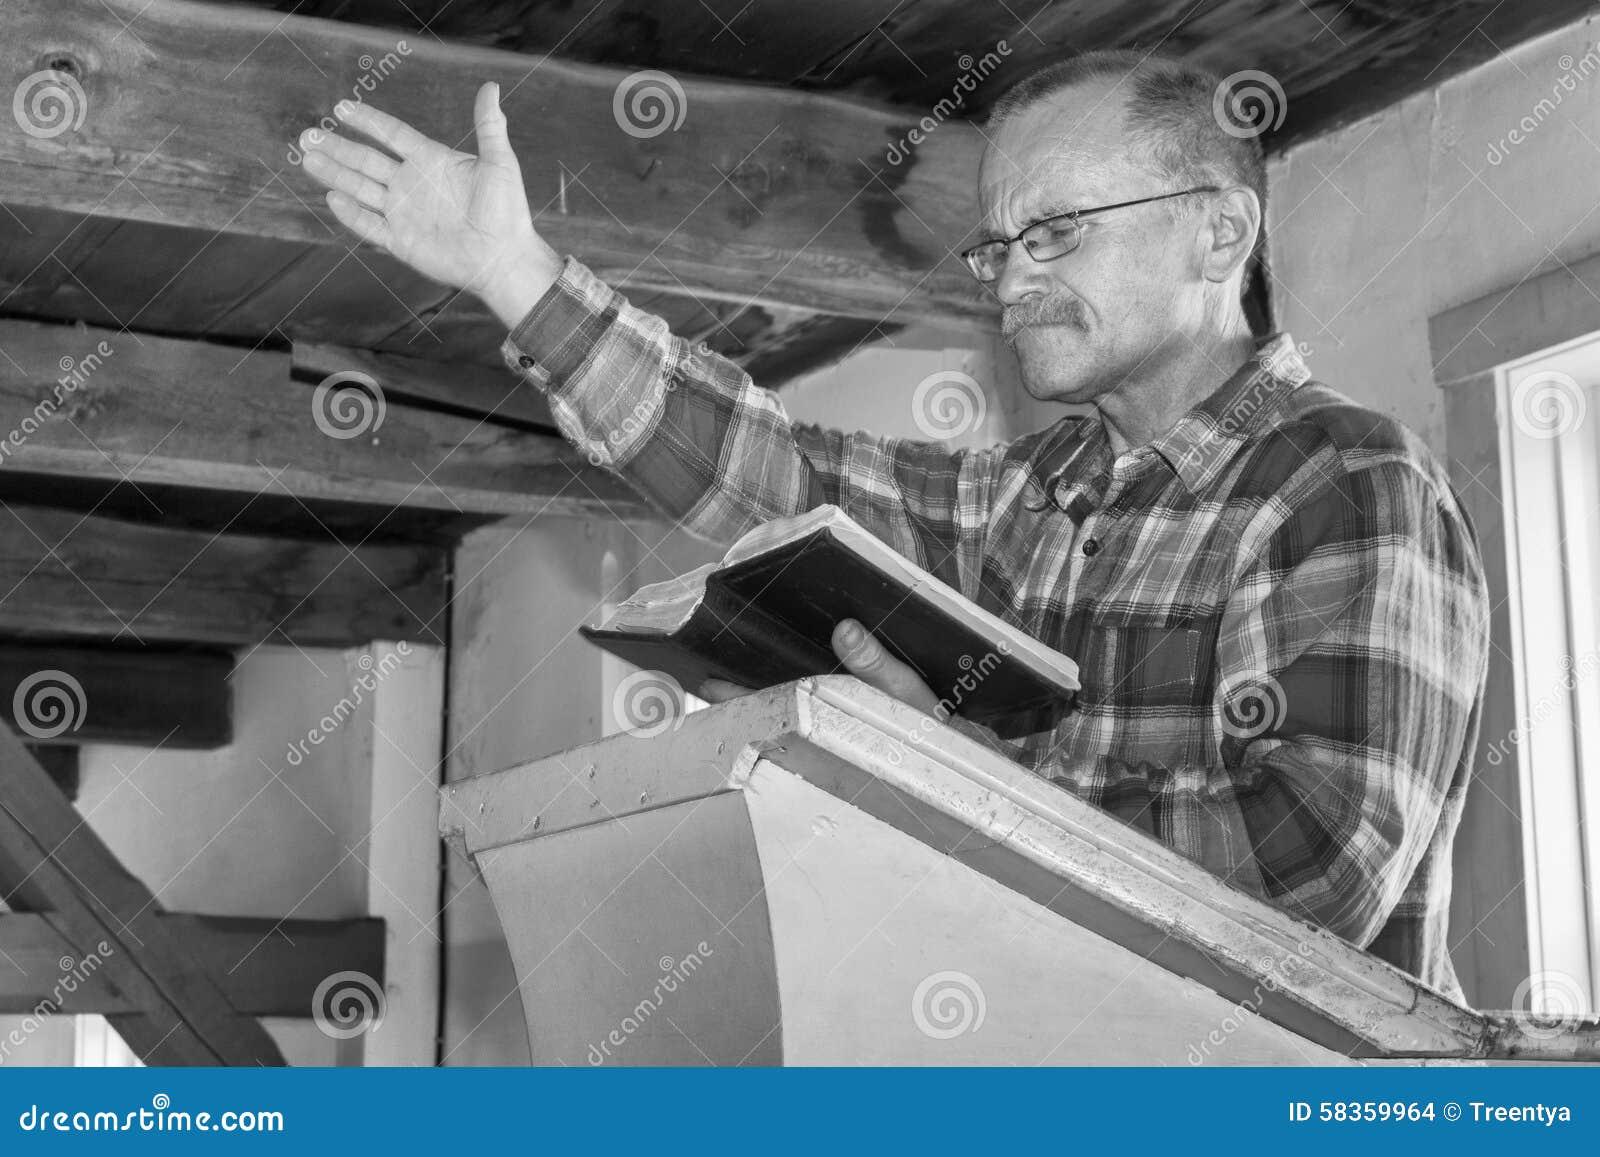 Download Man preaching stock photo. Image of information, evangelist - 58359964